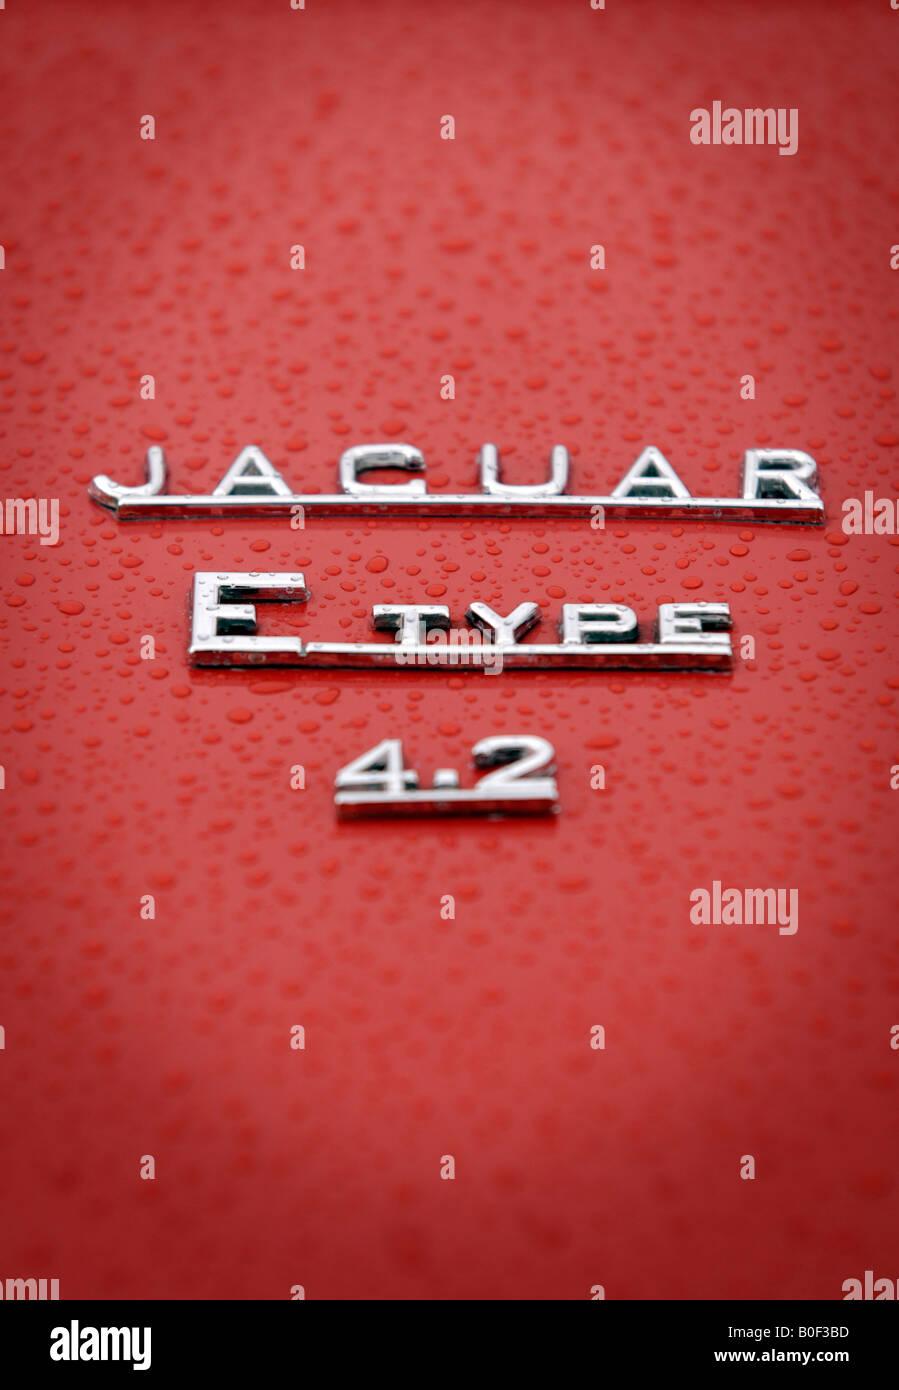 E Car Icon Stock Photos Images Alamy Volvo Pv444 Wiring Diagram Vintage Electrical Jaguar Type 42 Badge Image